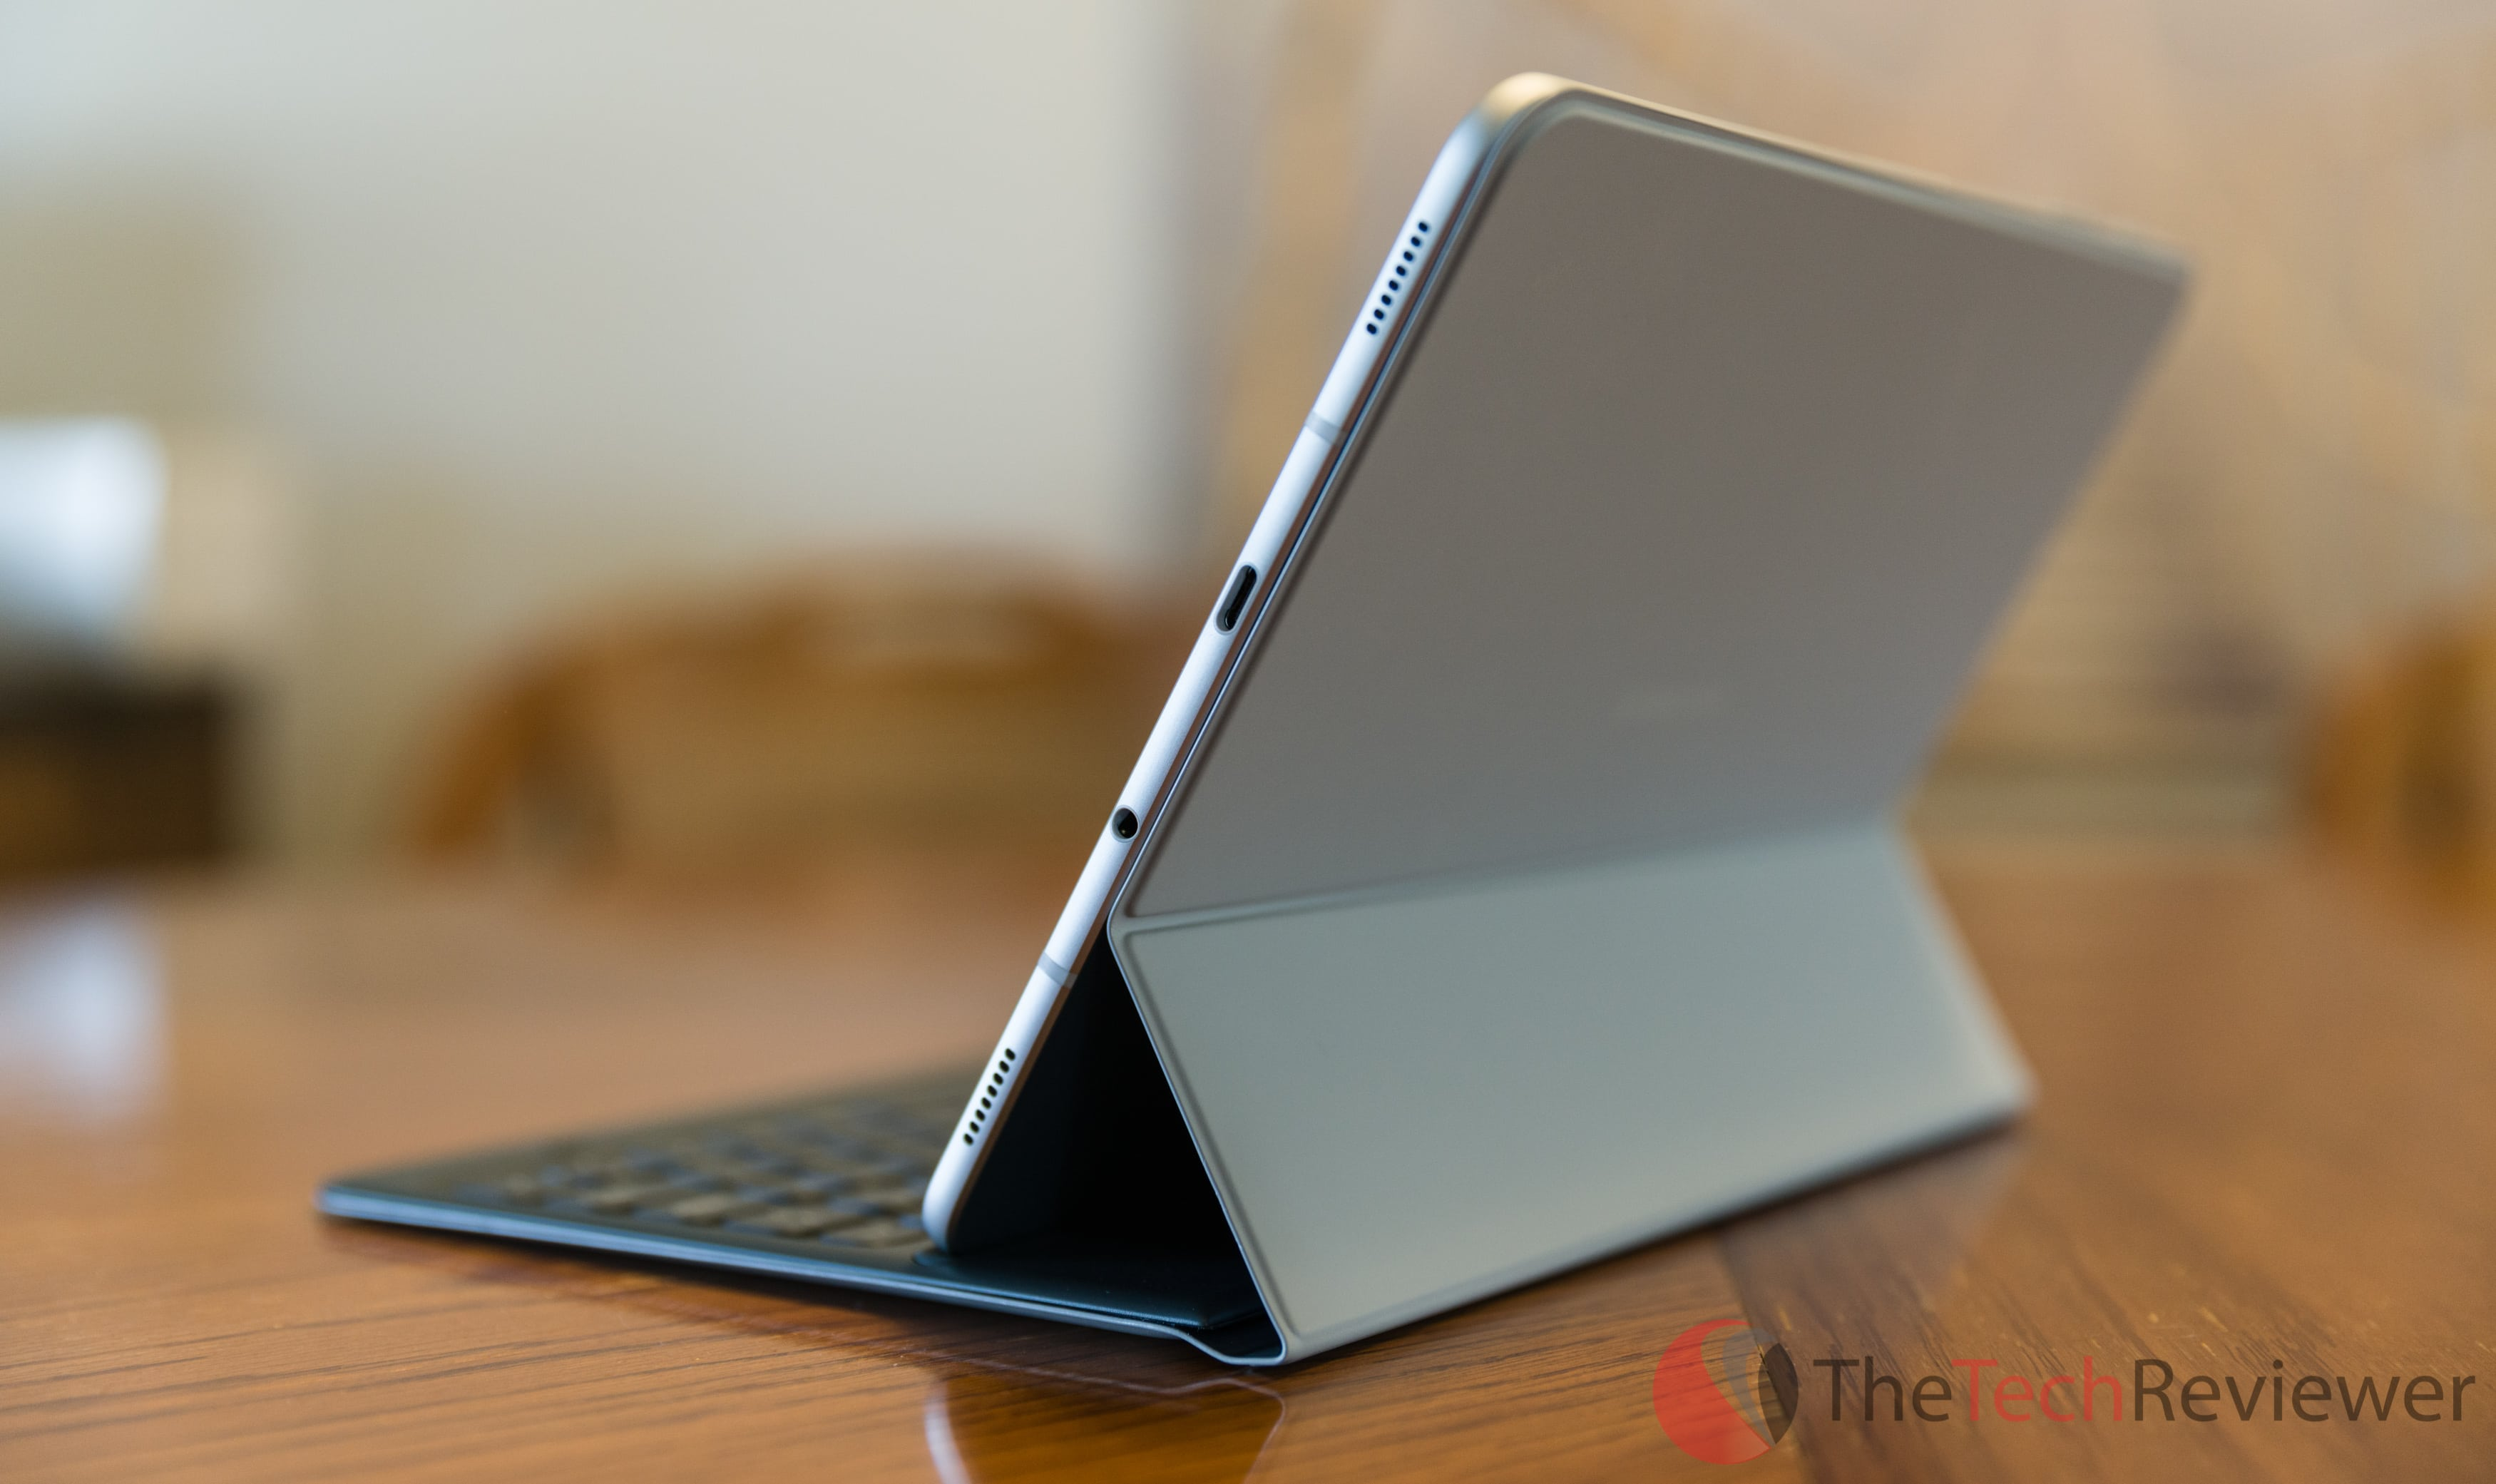 Samsung Galaxy Tab S3 9 of 10